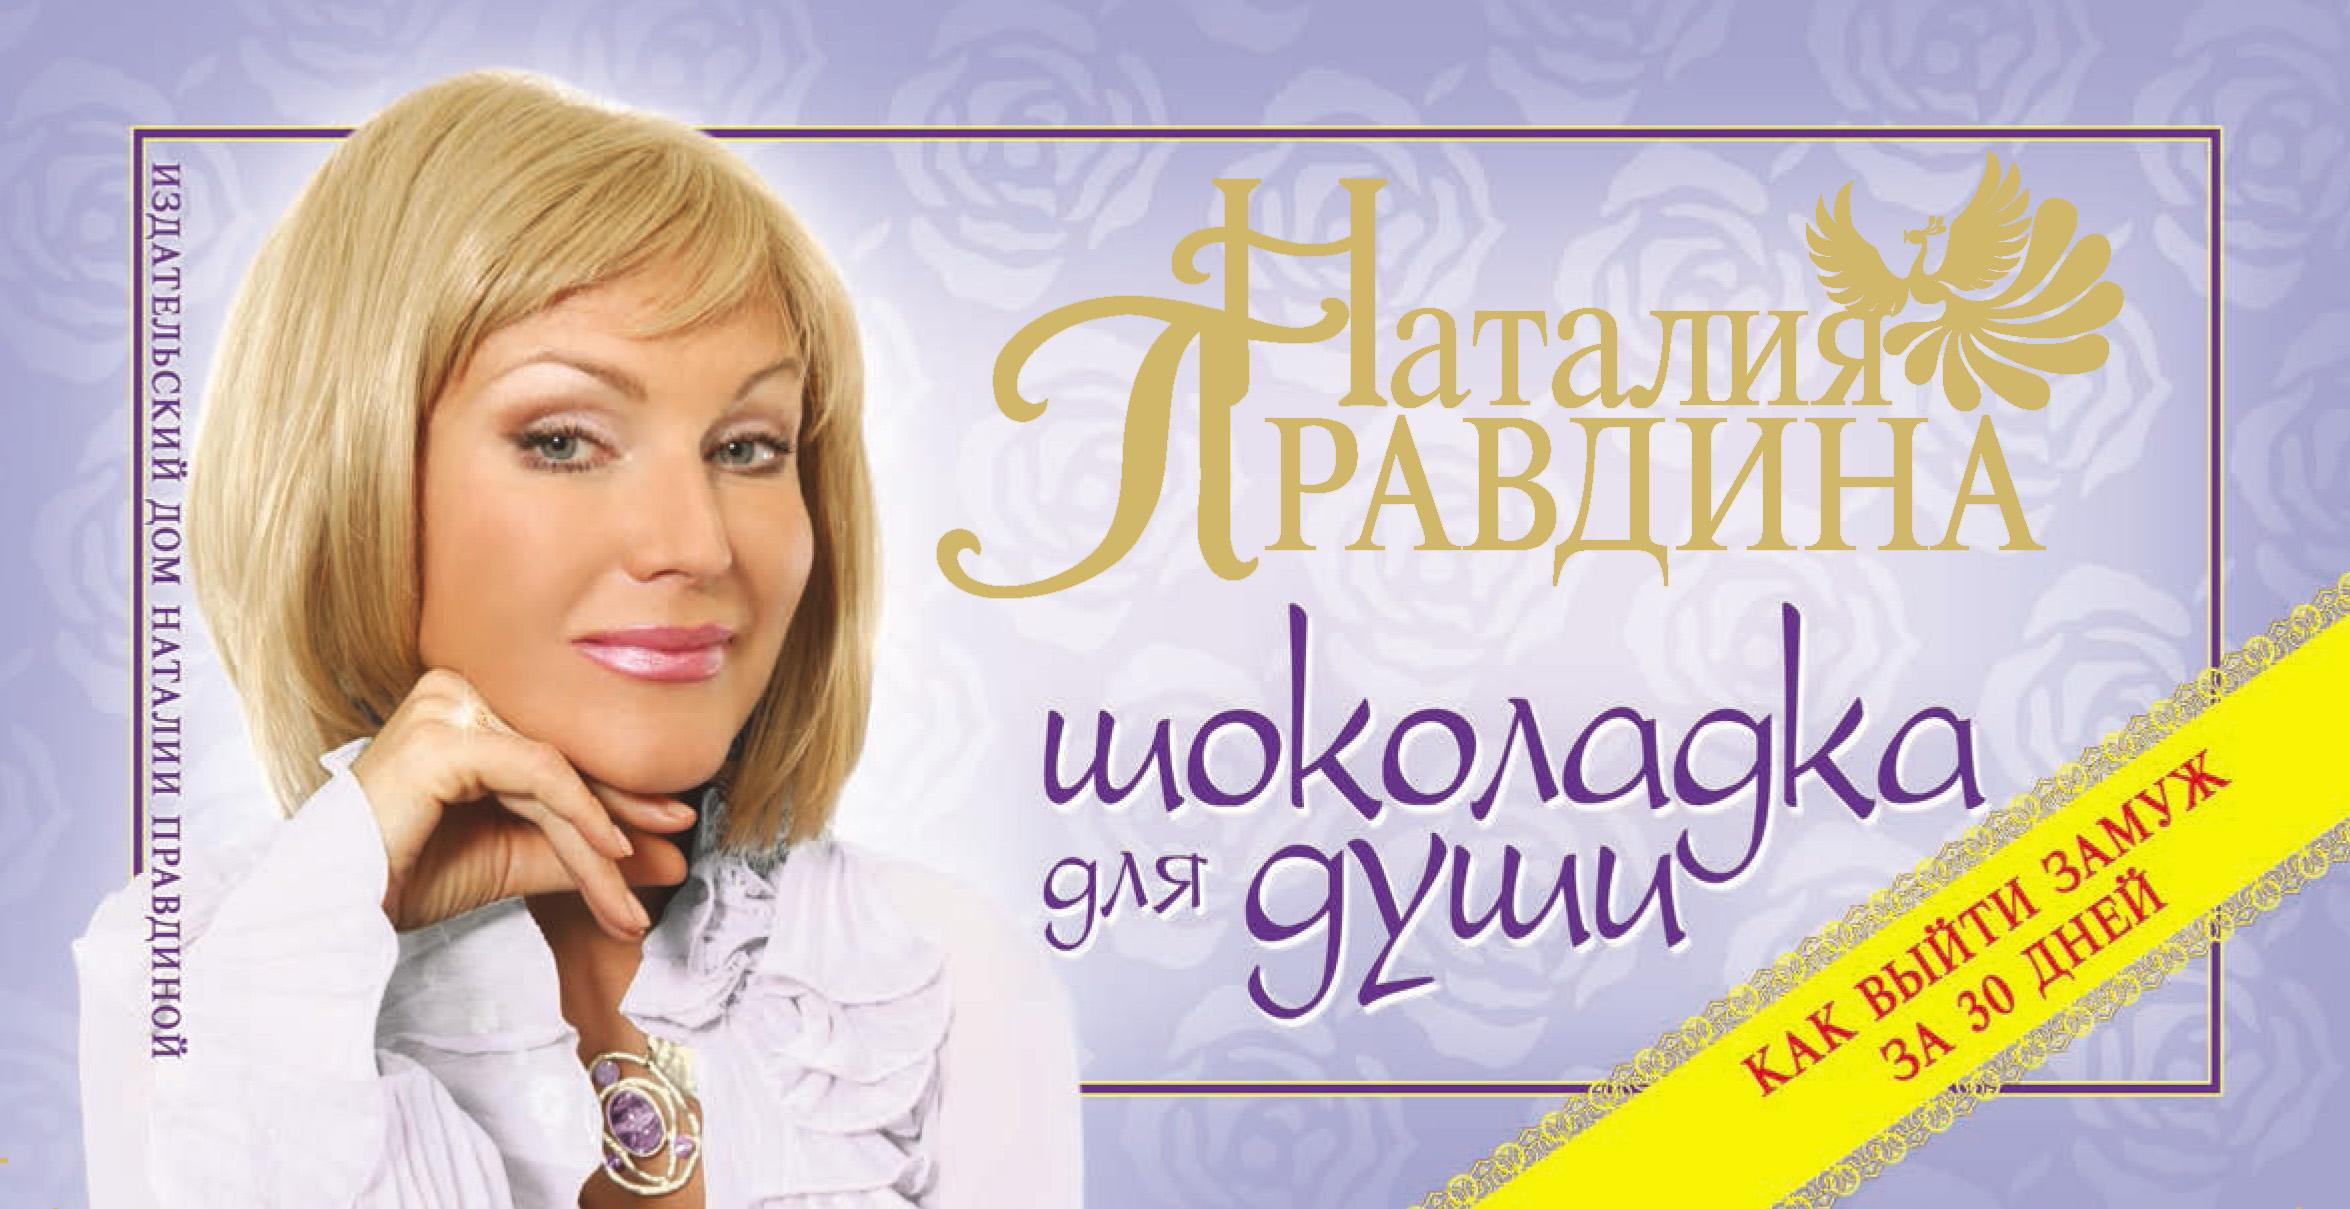 Наталия Правдина Шоколадка для души, или Как выйти замуж за 30 дней правдина н ред правдина isbn 9785912071805